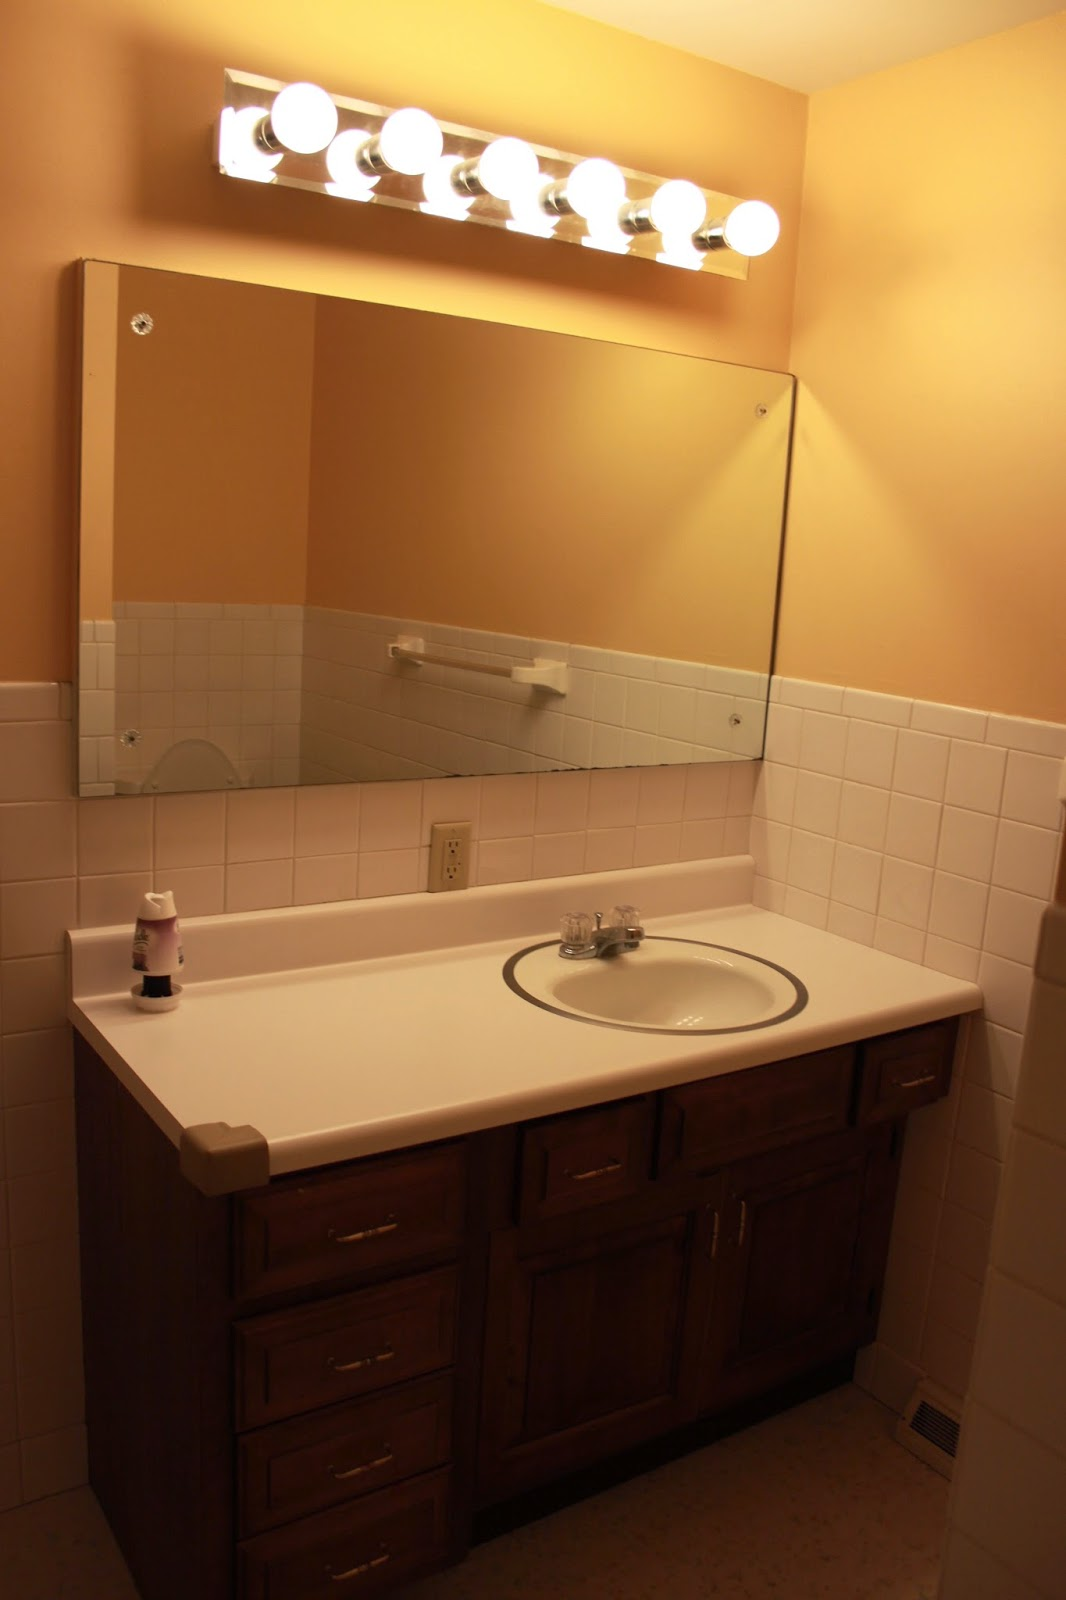 New Bathroom Sink Faucet